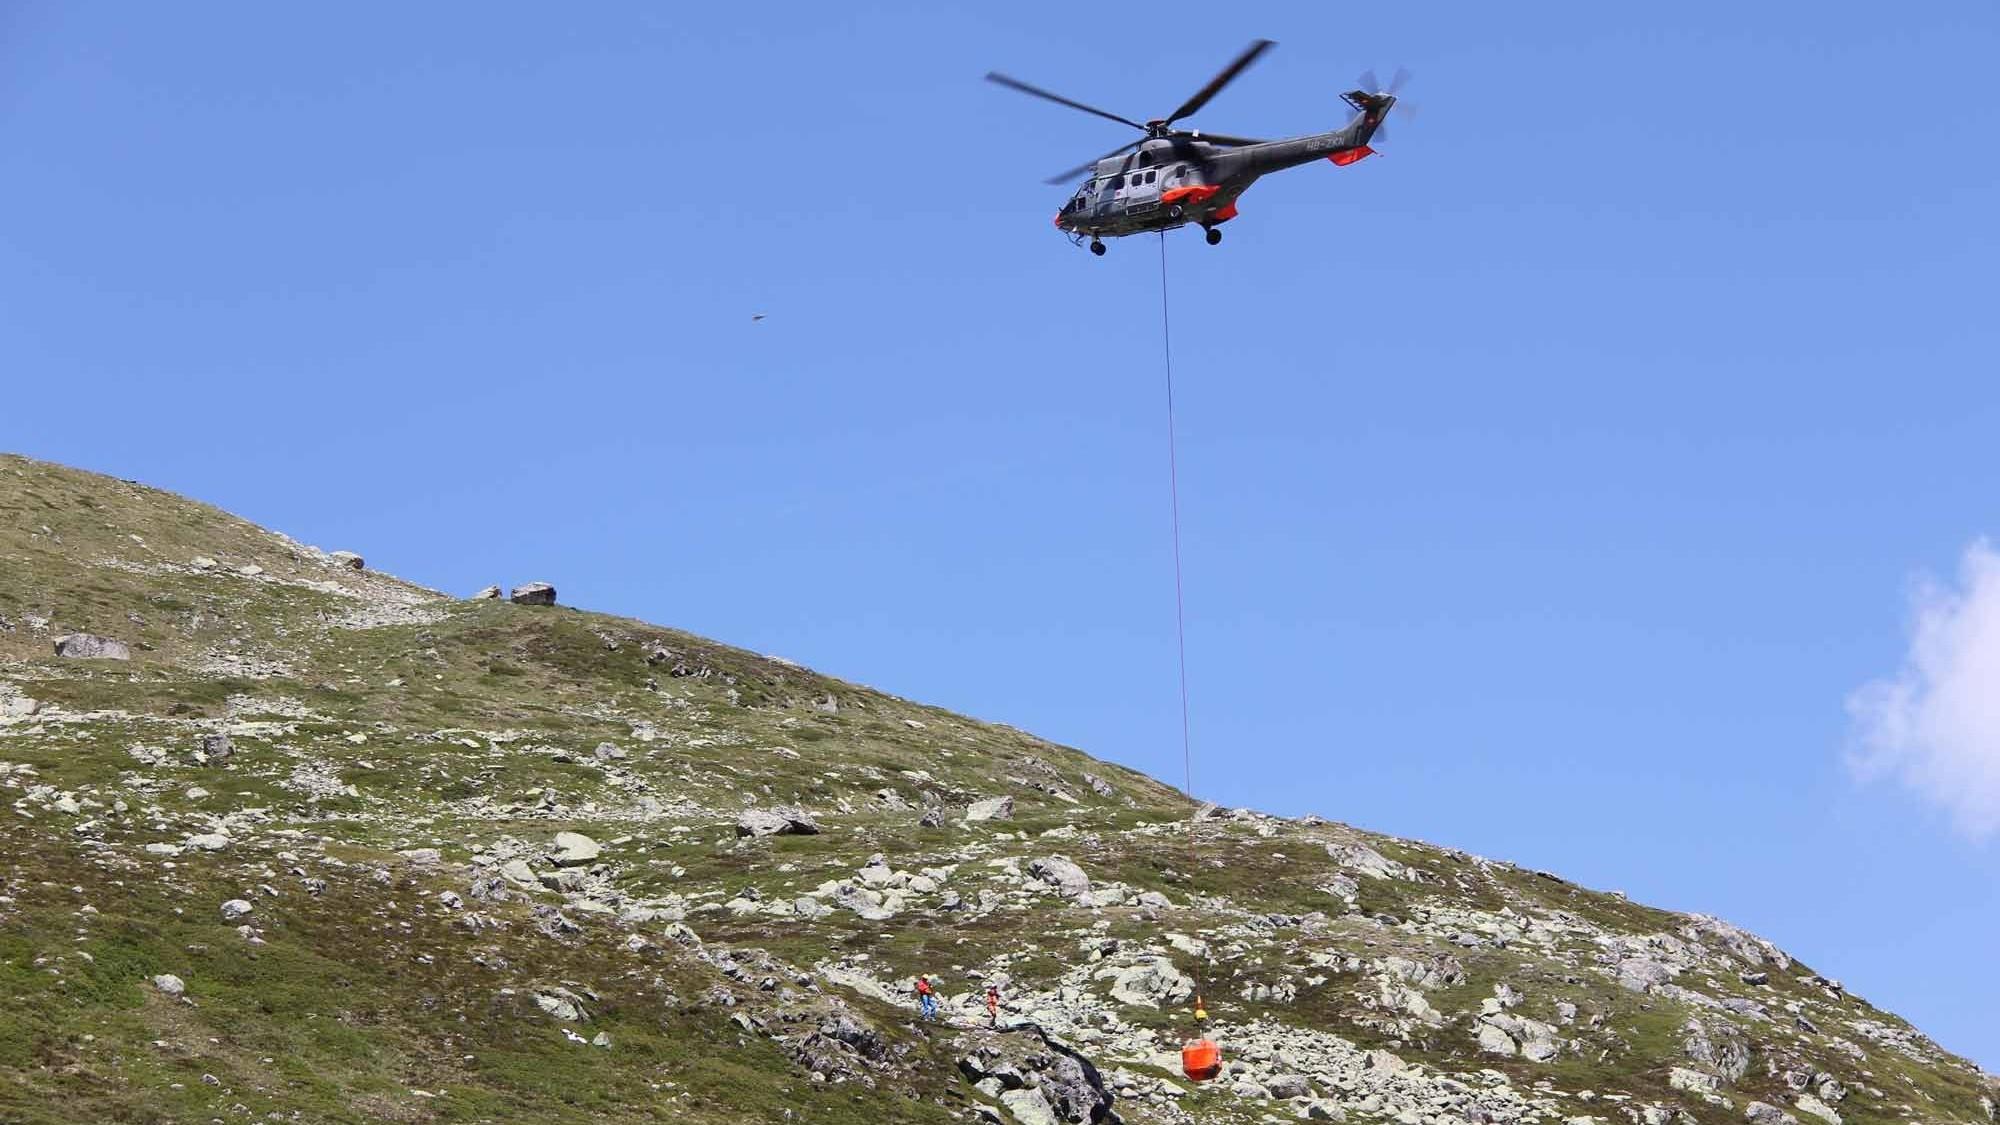 Helikopter transportiert Betonblock für Steinschlagversuch